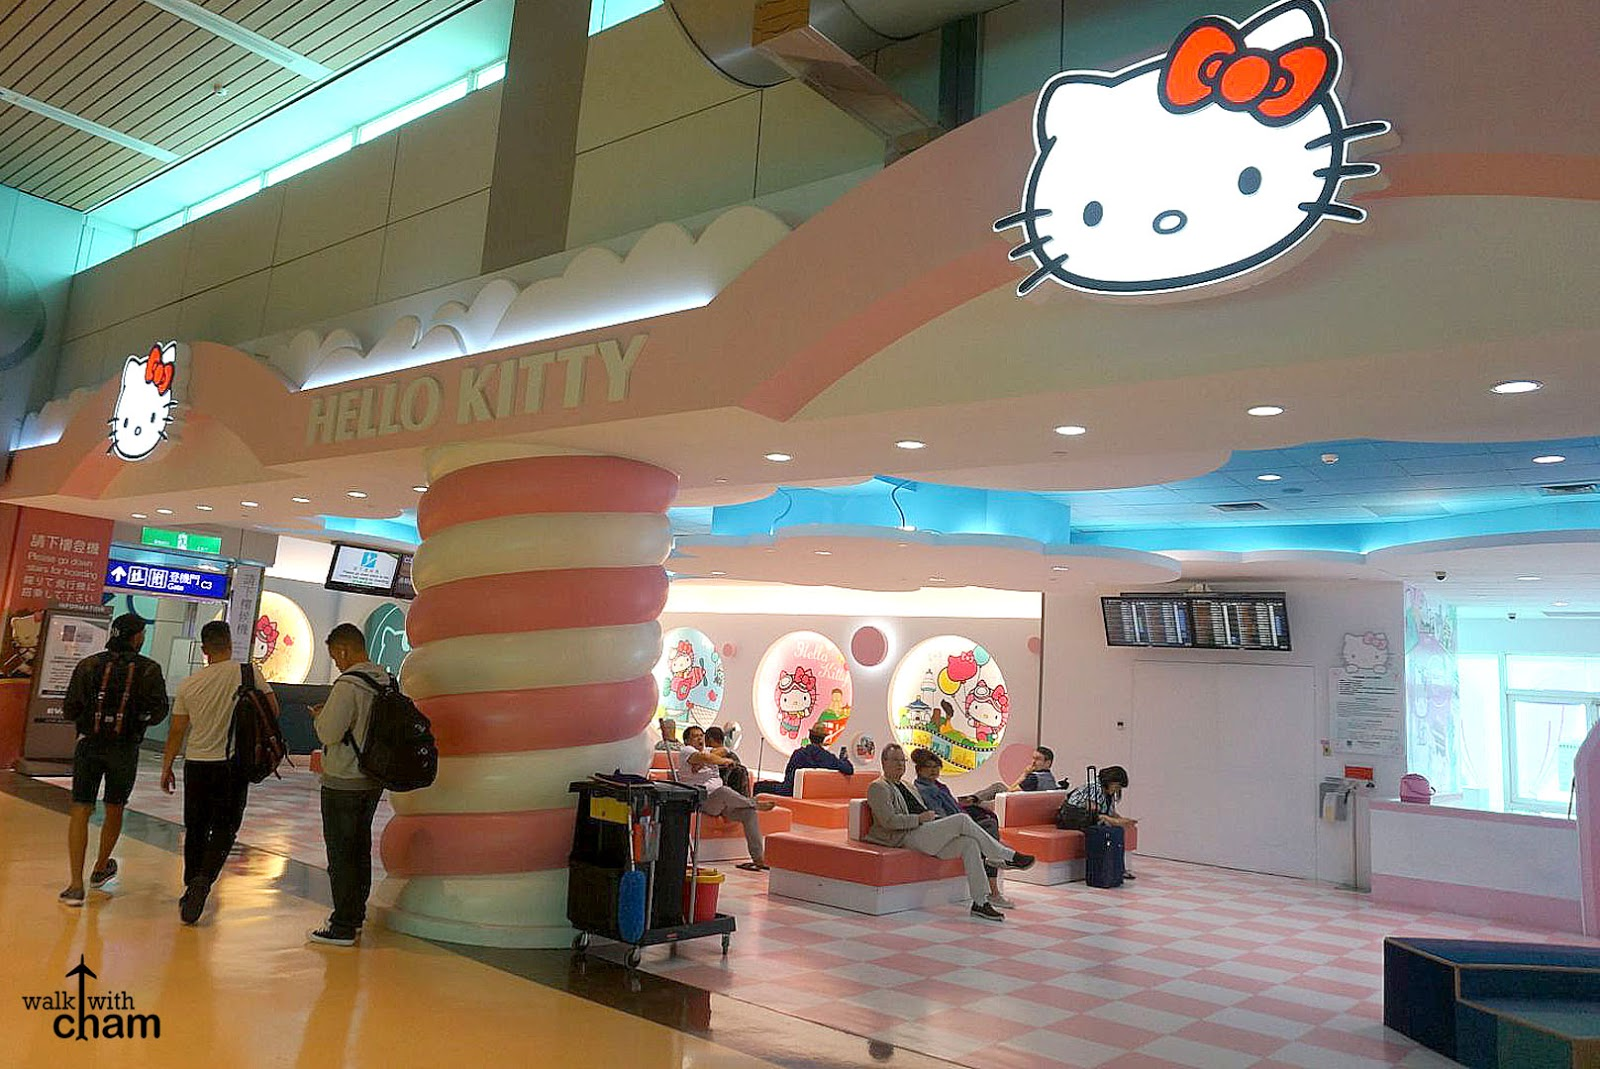 Walk With Cham Hello Kitty Eva Air From Paris To Taipei